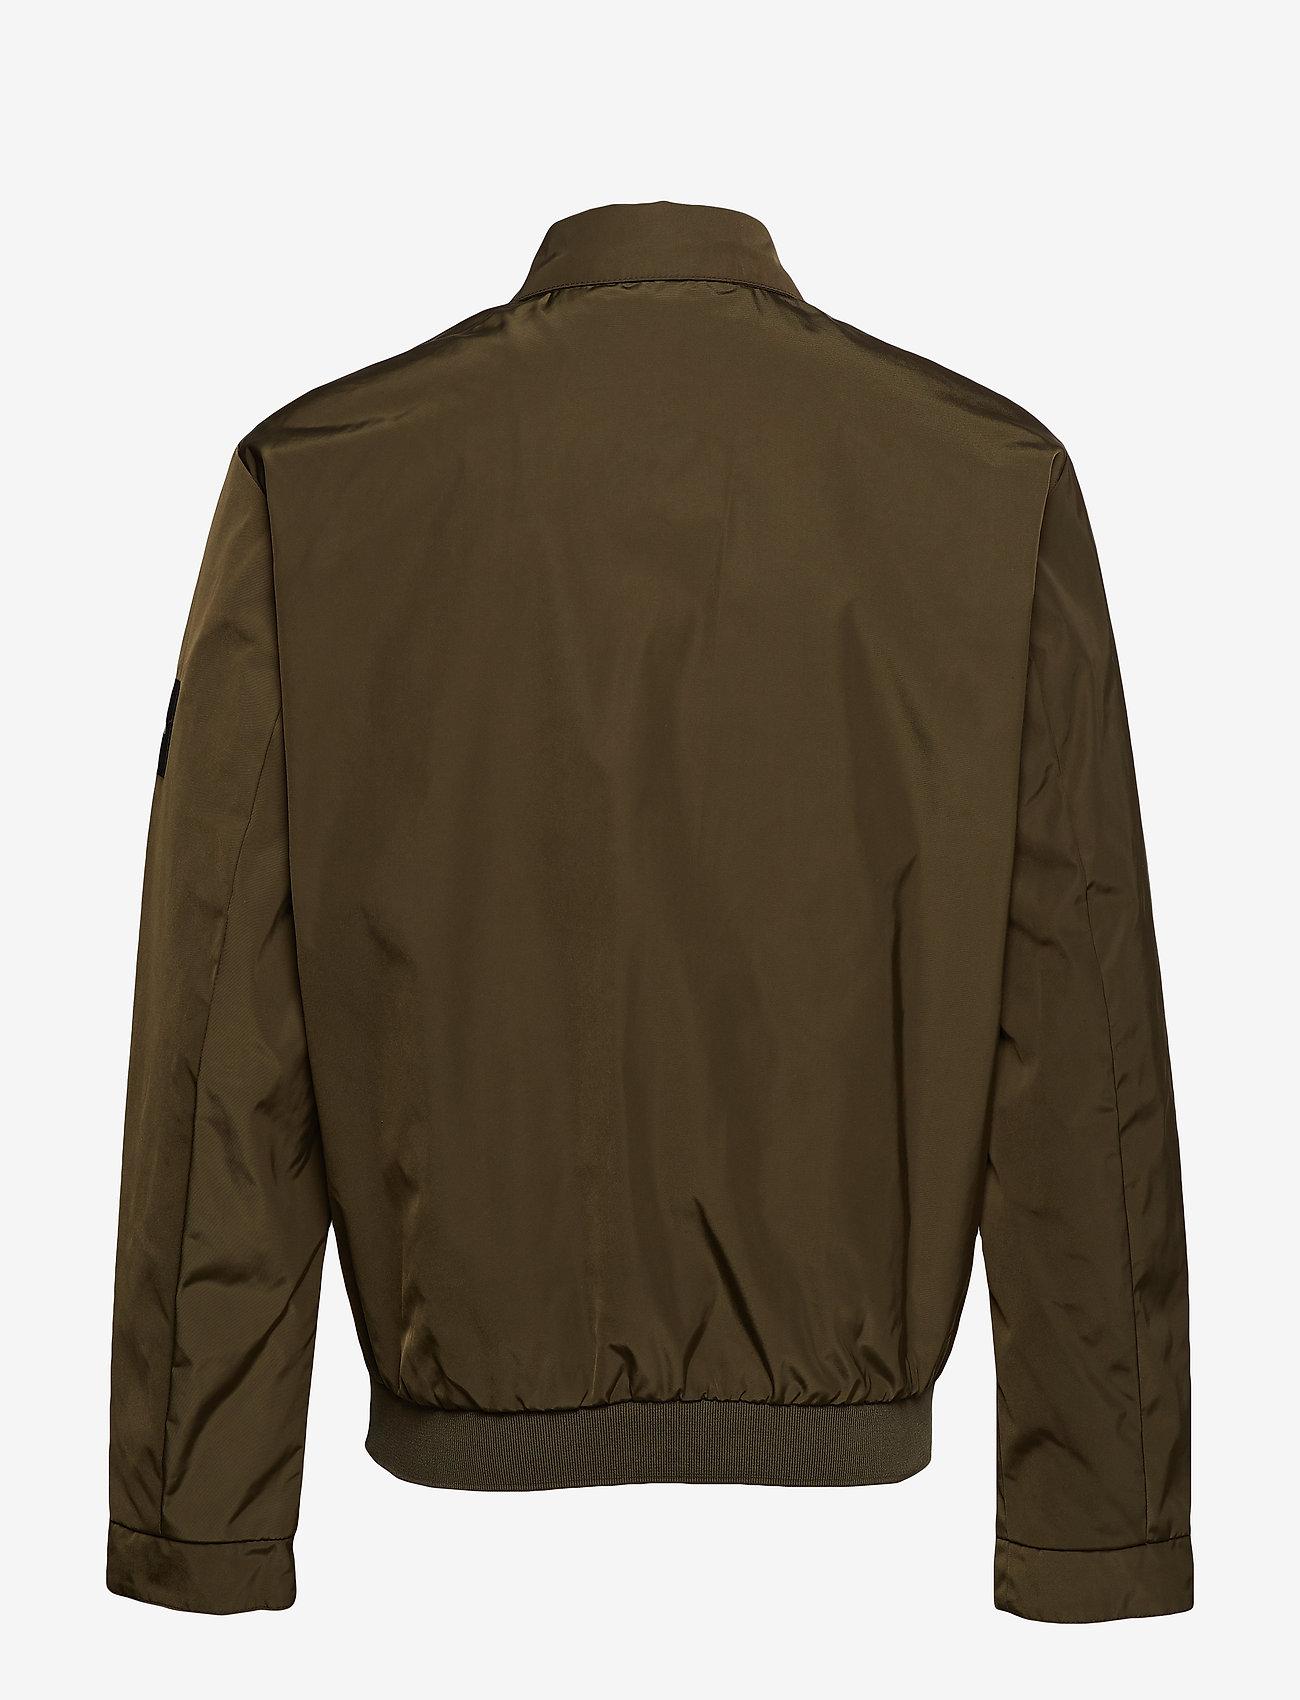 Calvin Klein - NYLON HARRINGTON JAC - light jackets - ck dark olive - 1